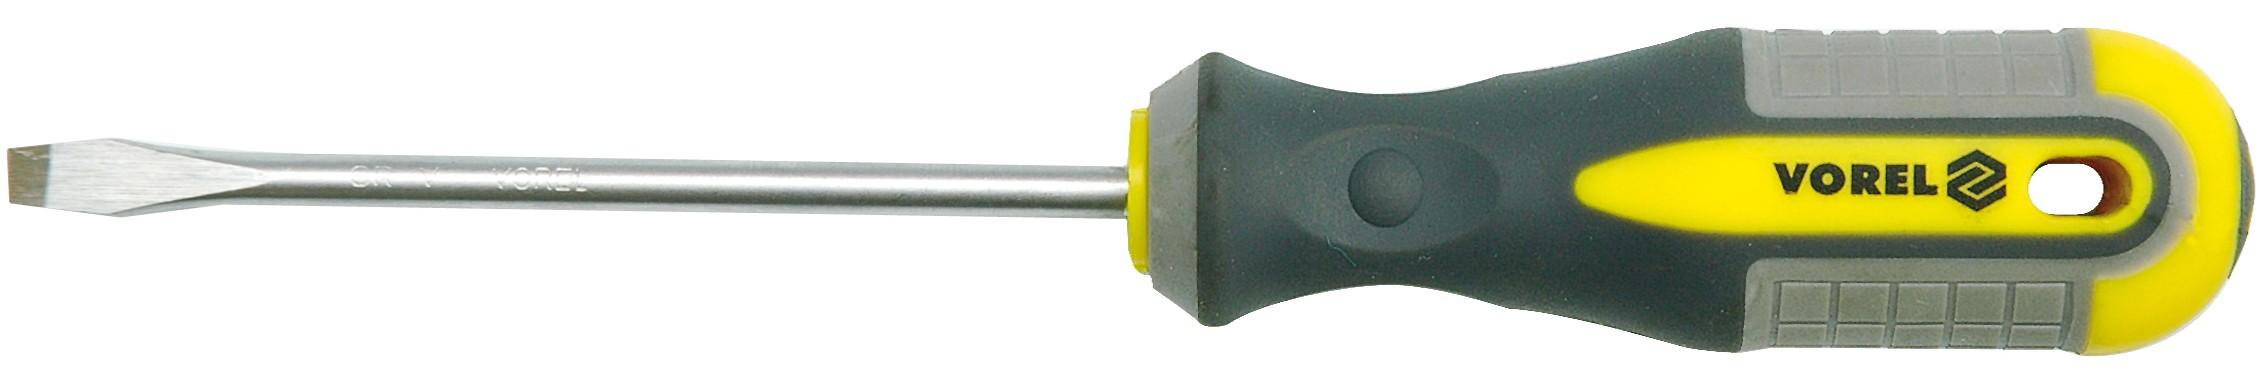 Šroubovák plochý 6 x 200 mm